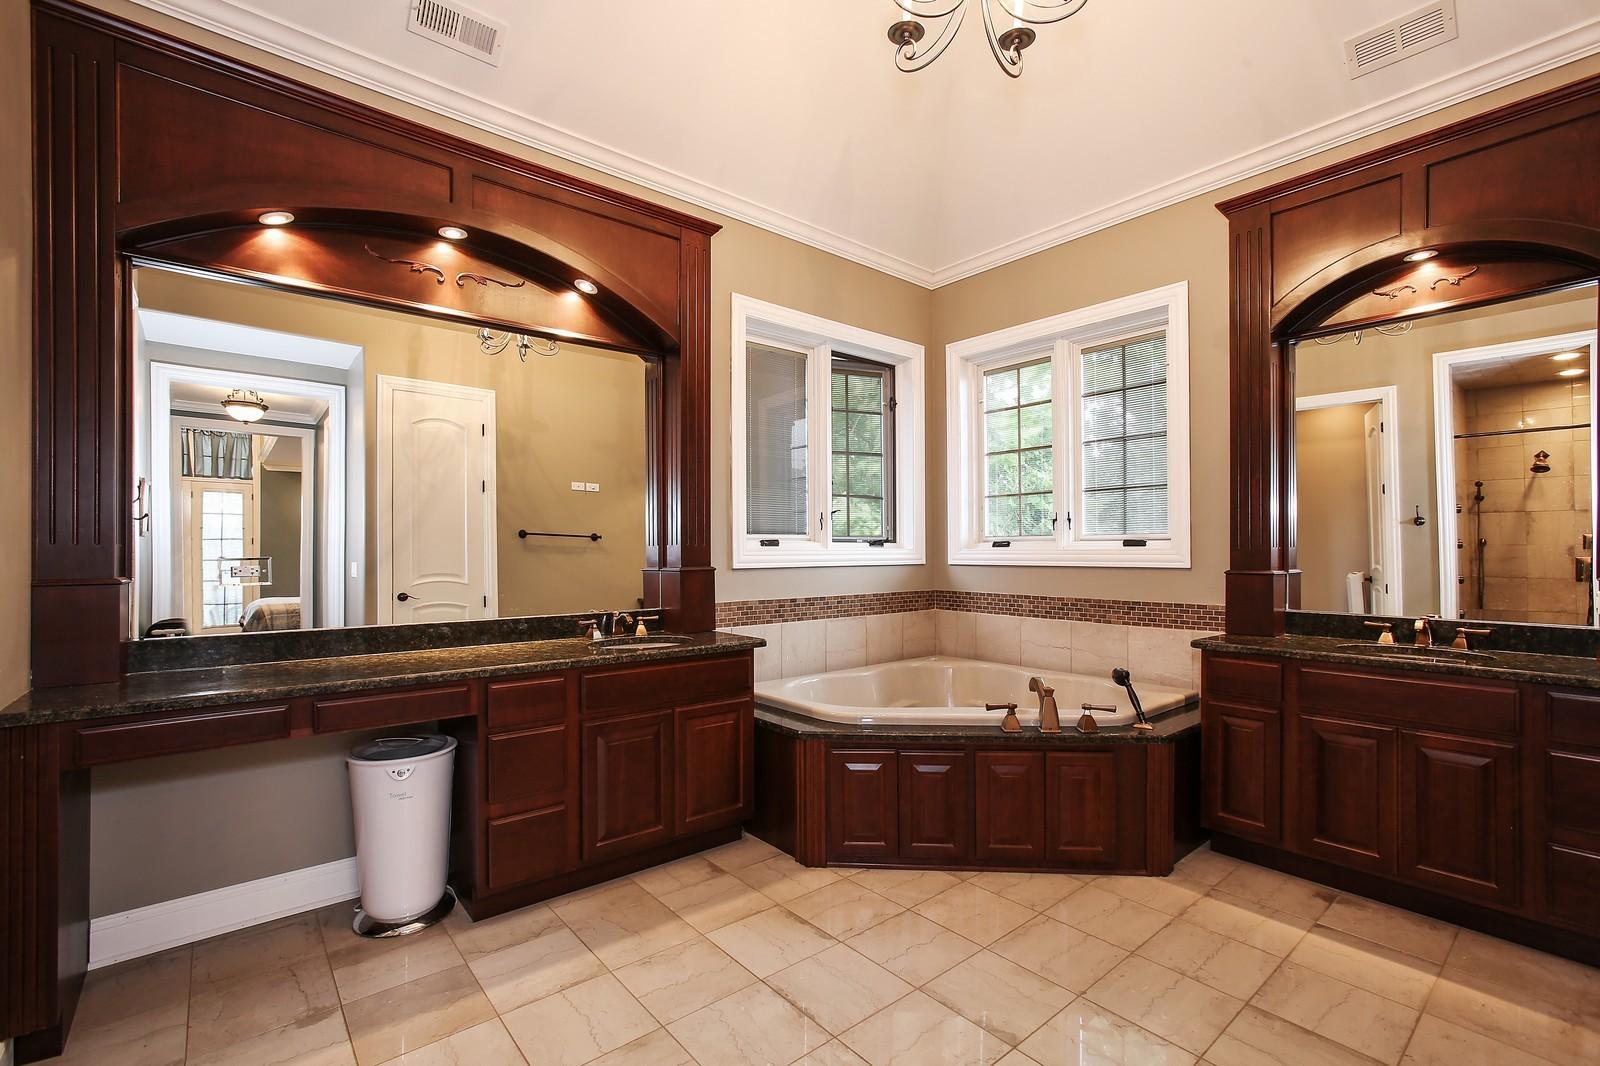 Real Estate Photography - 719 S Hillside Ave, Elmhurst, IL, 60126 - Master Bathroom